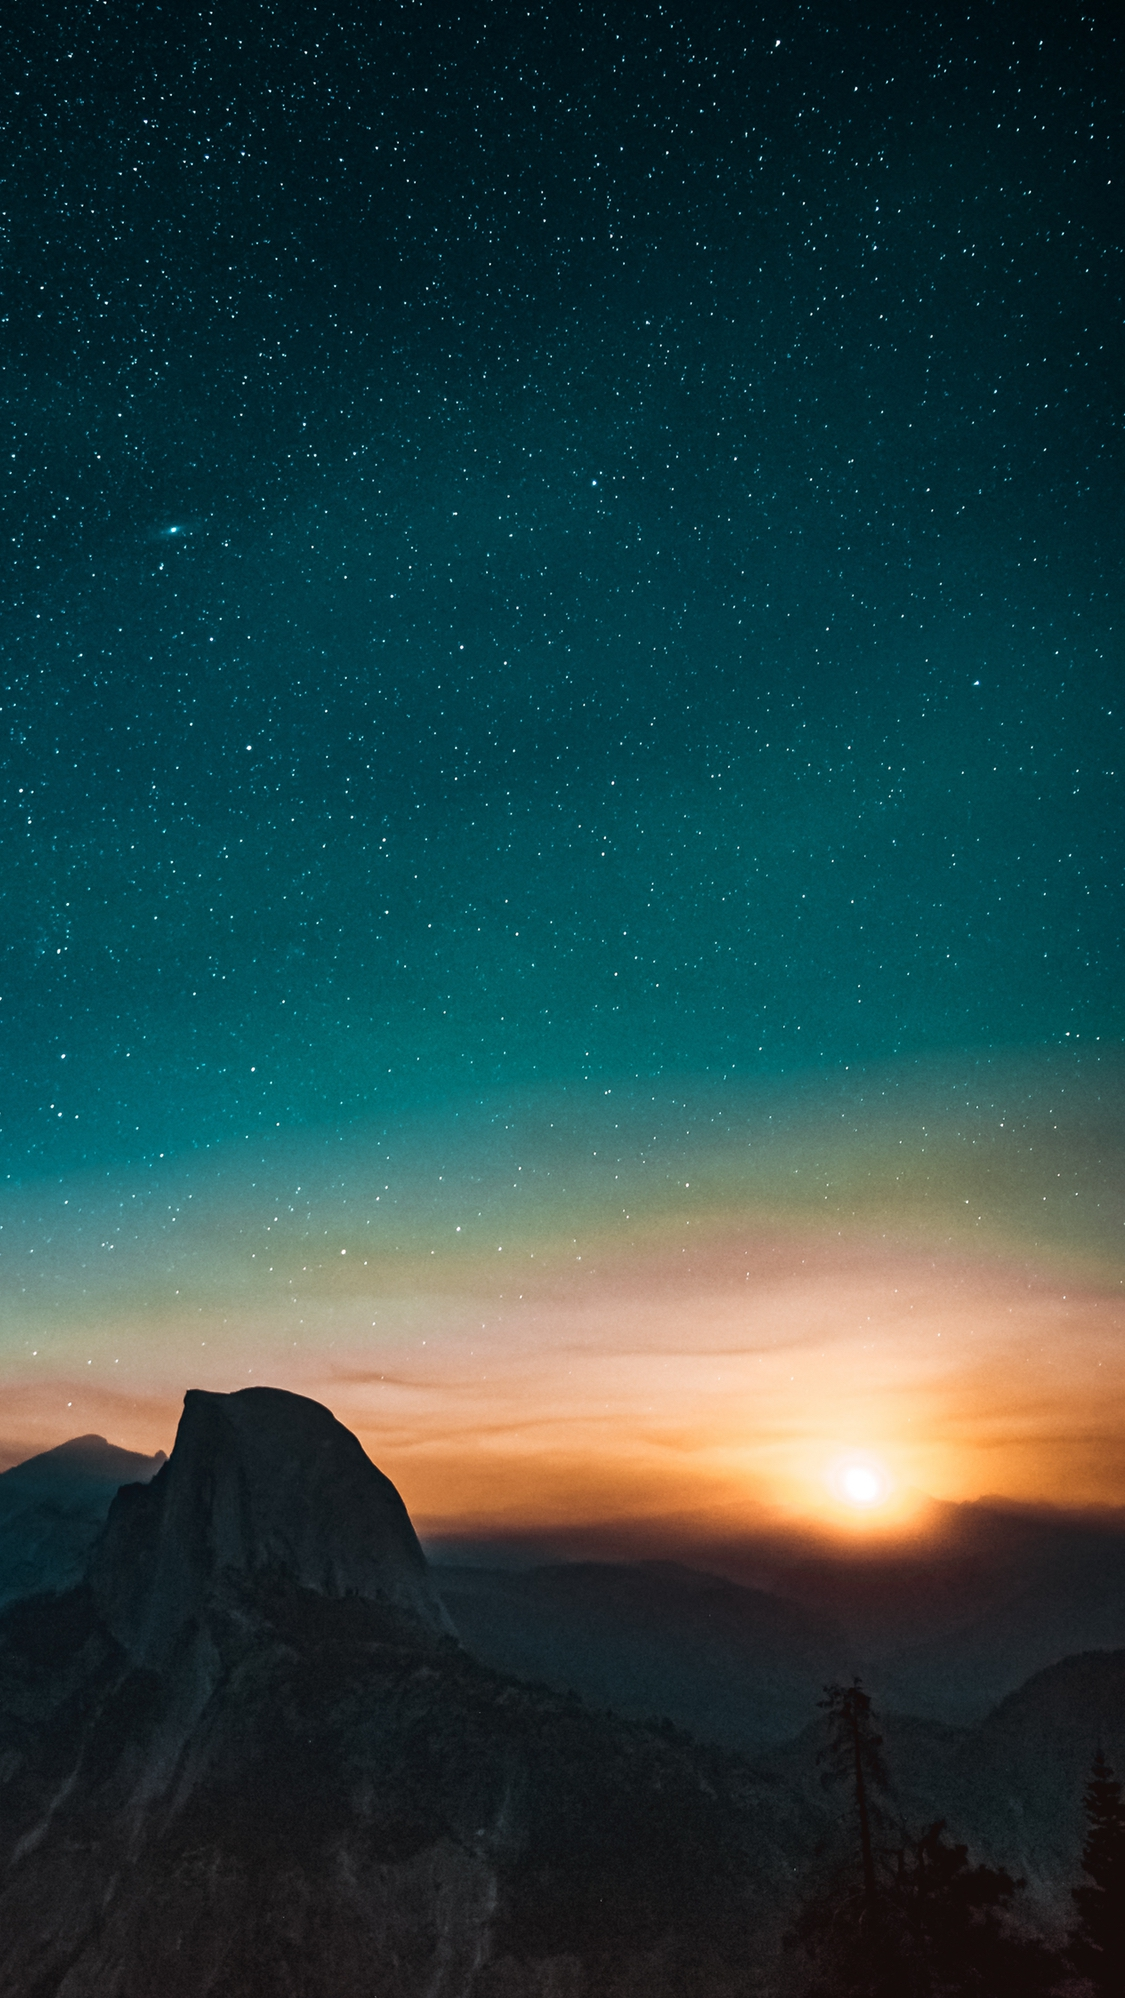 Yosemite National Park Night Sky View iPhone X Wallpaper